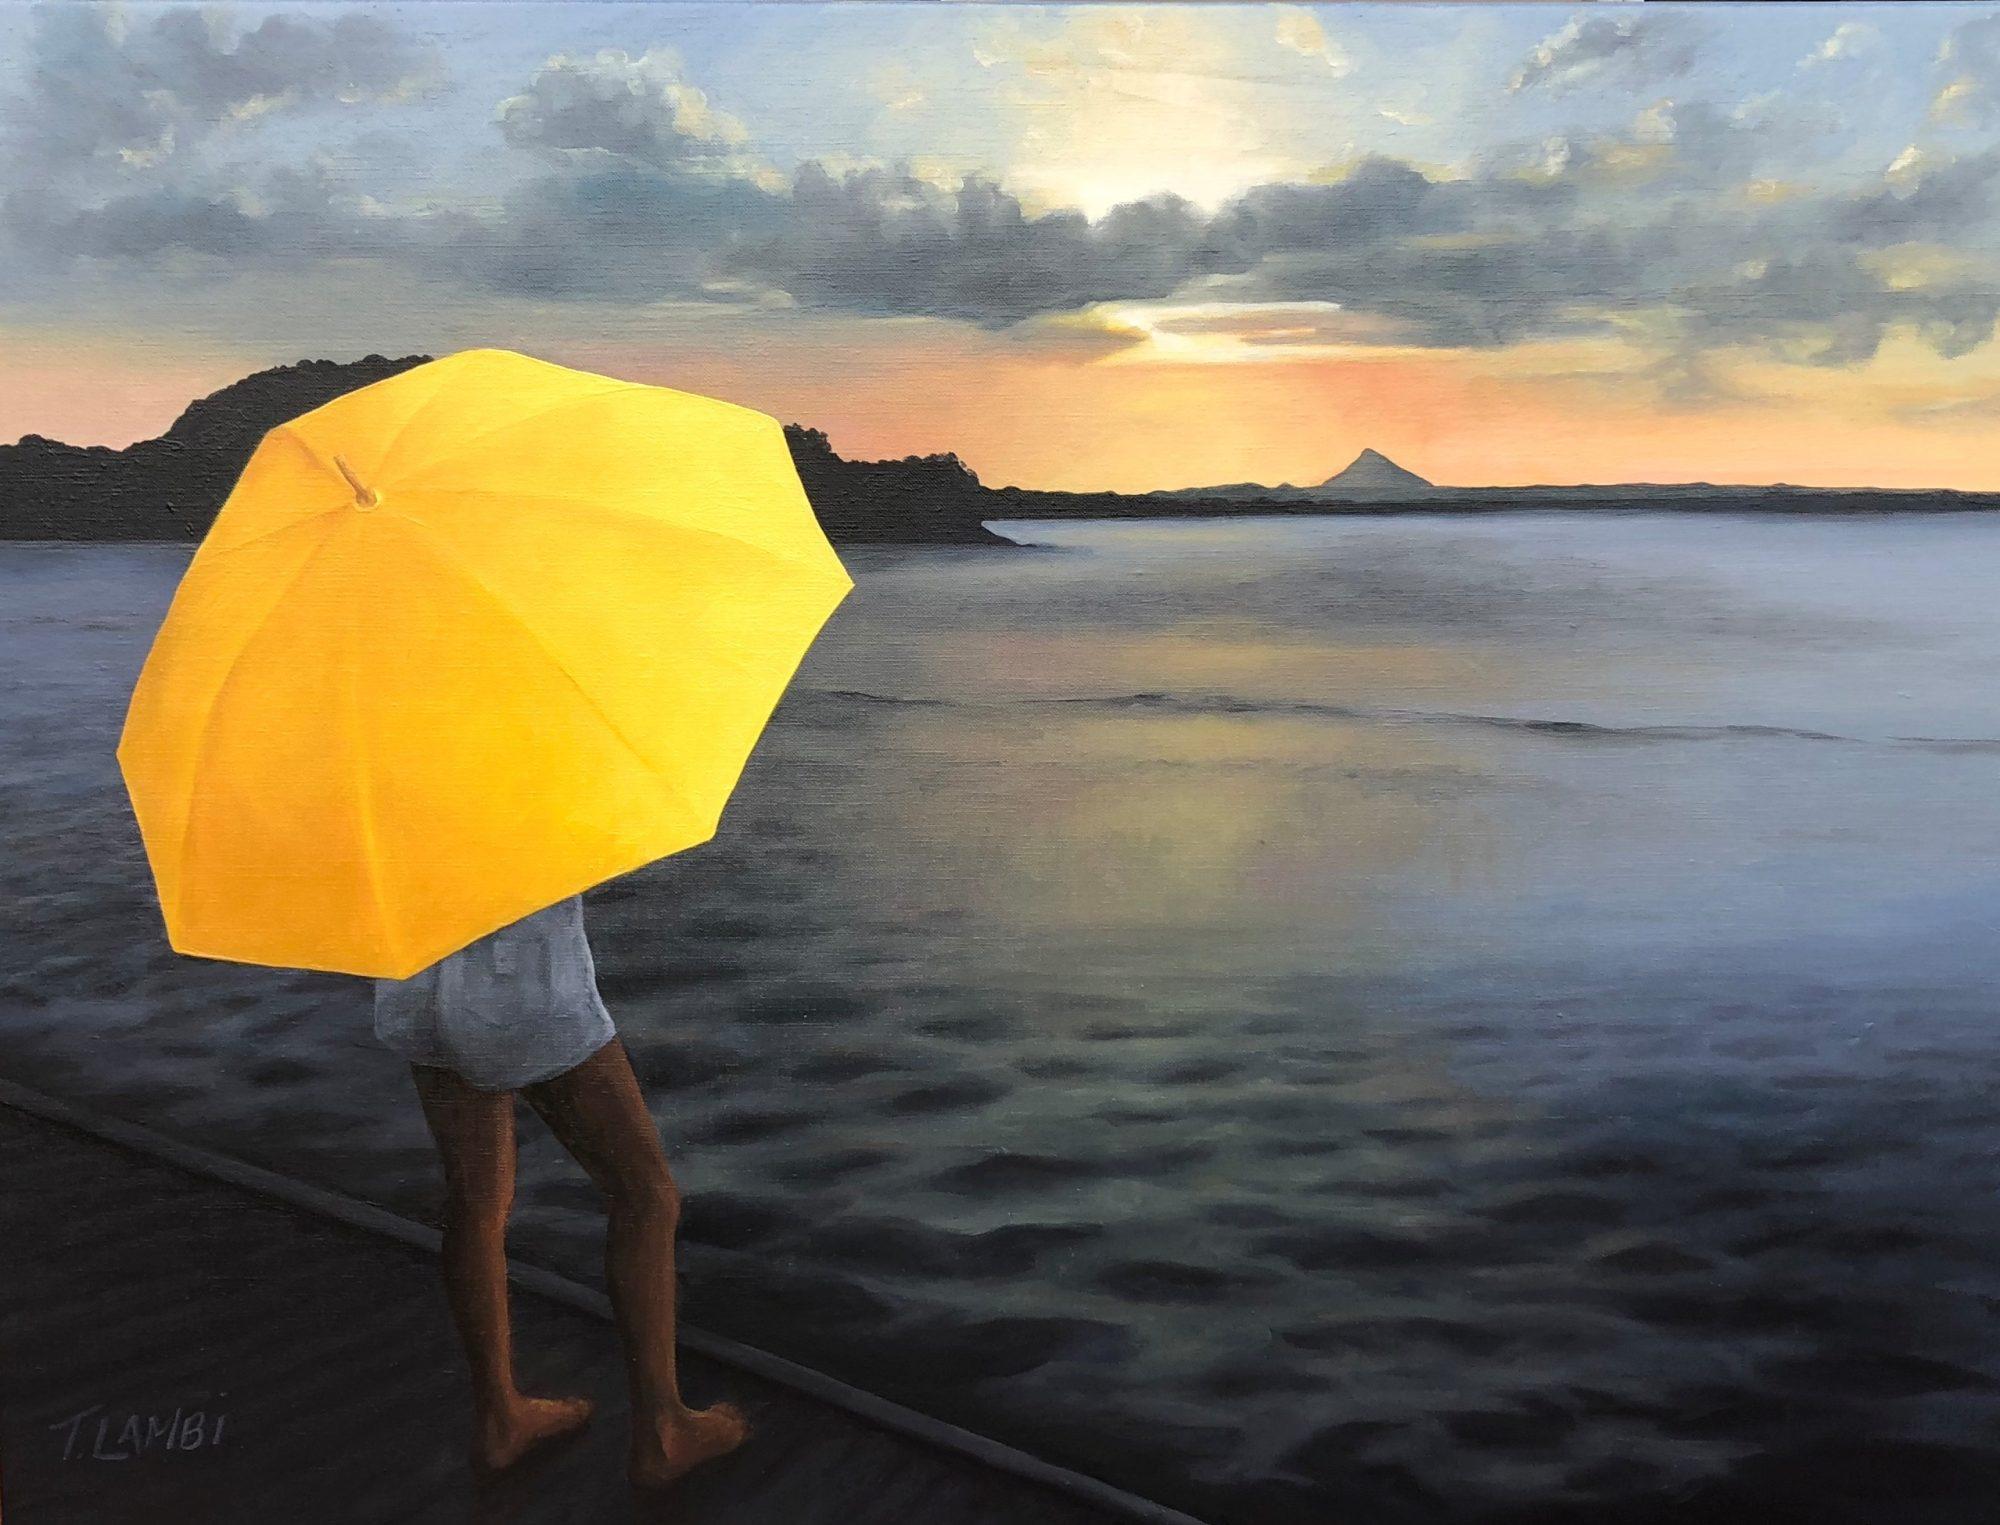 Trisha Lambi When Sunset Paints Us Gold